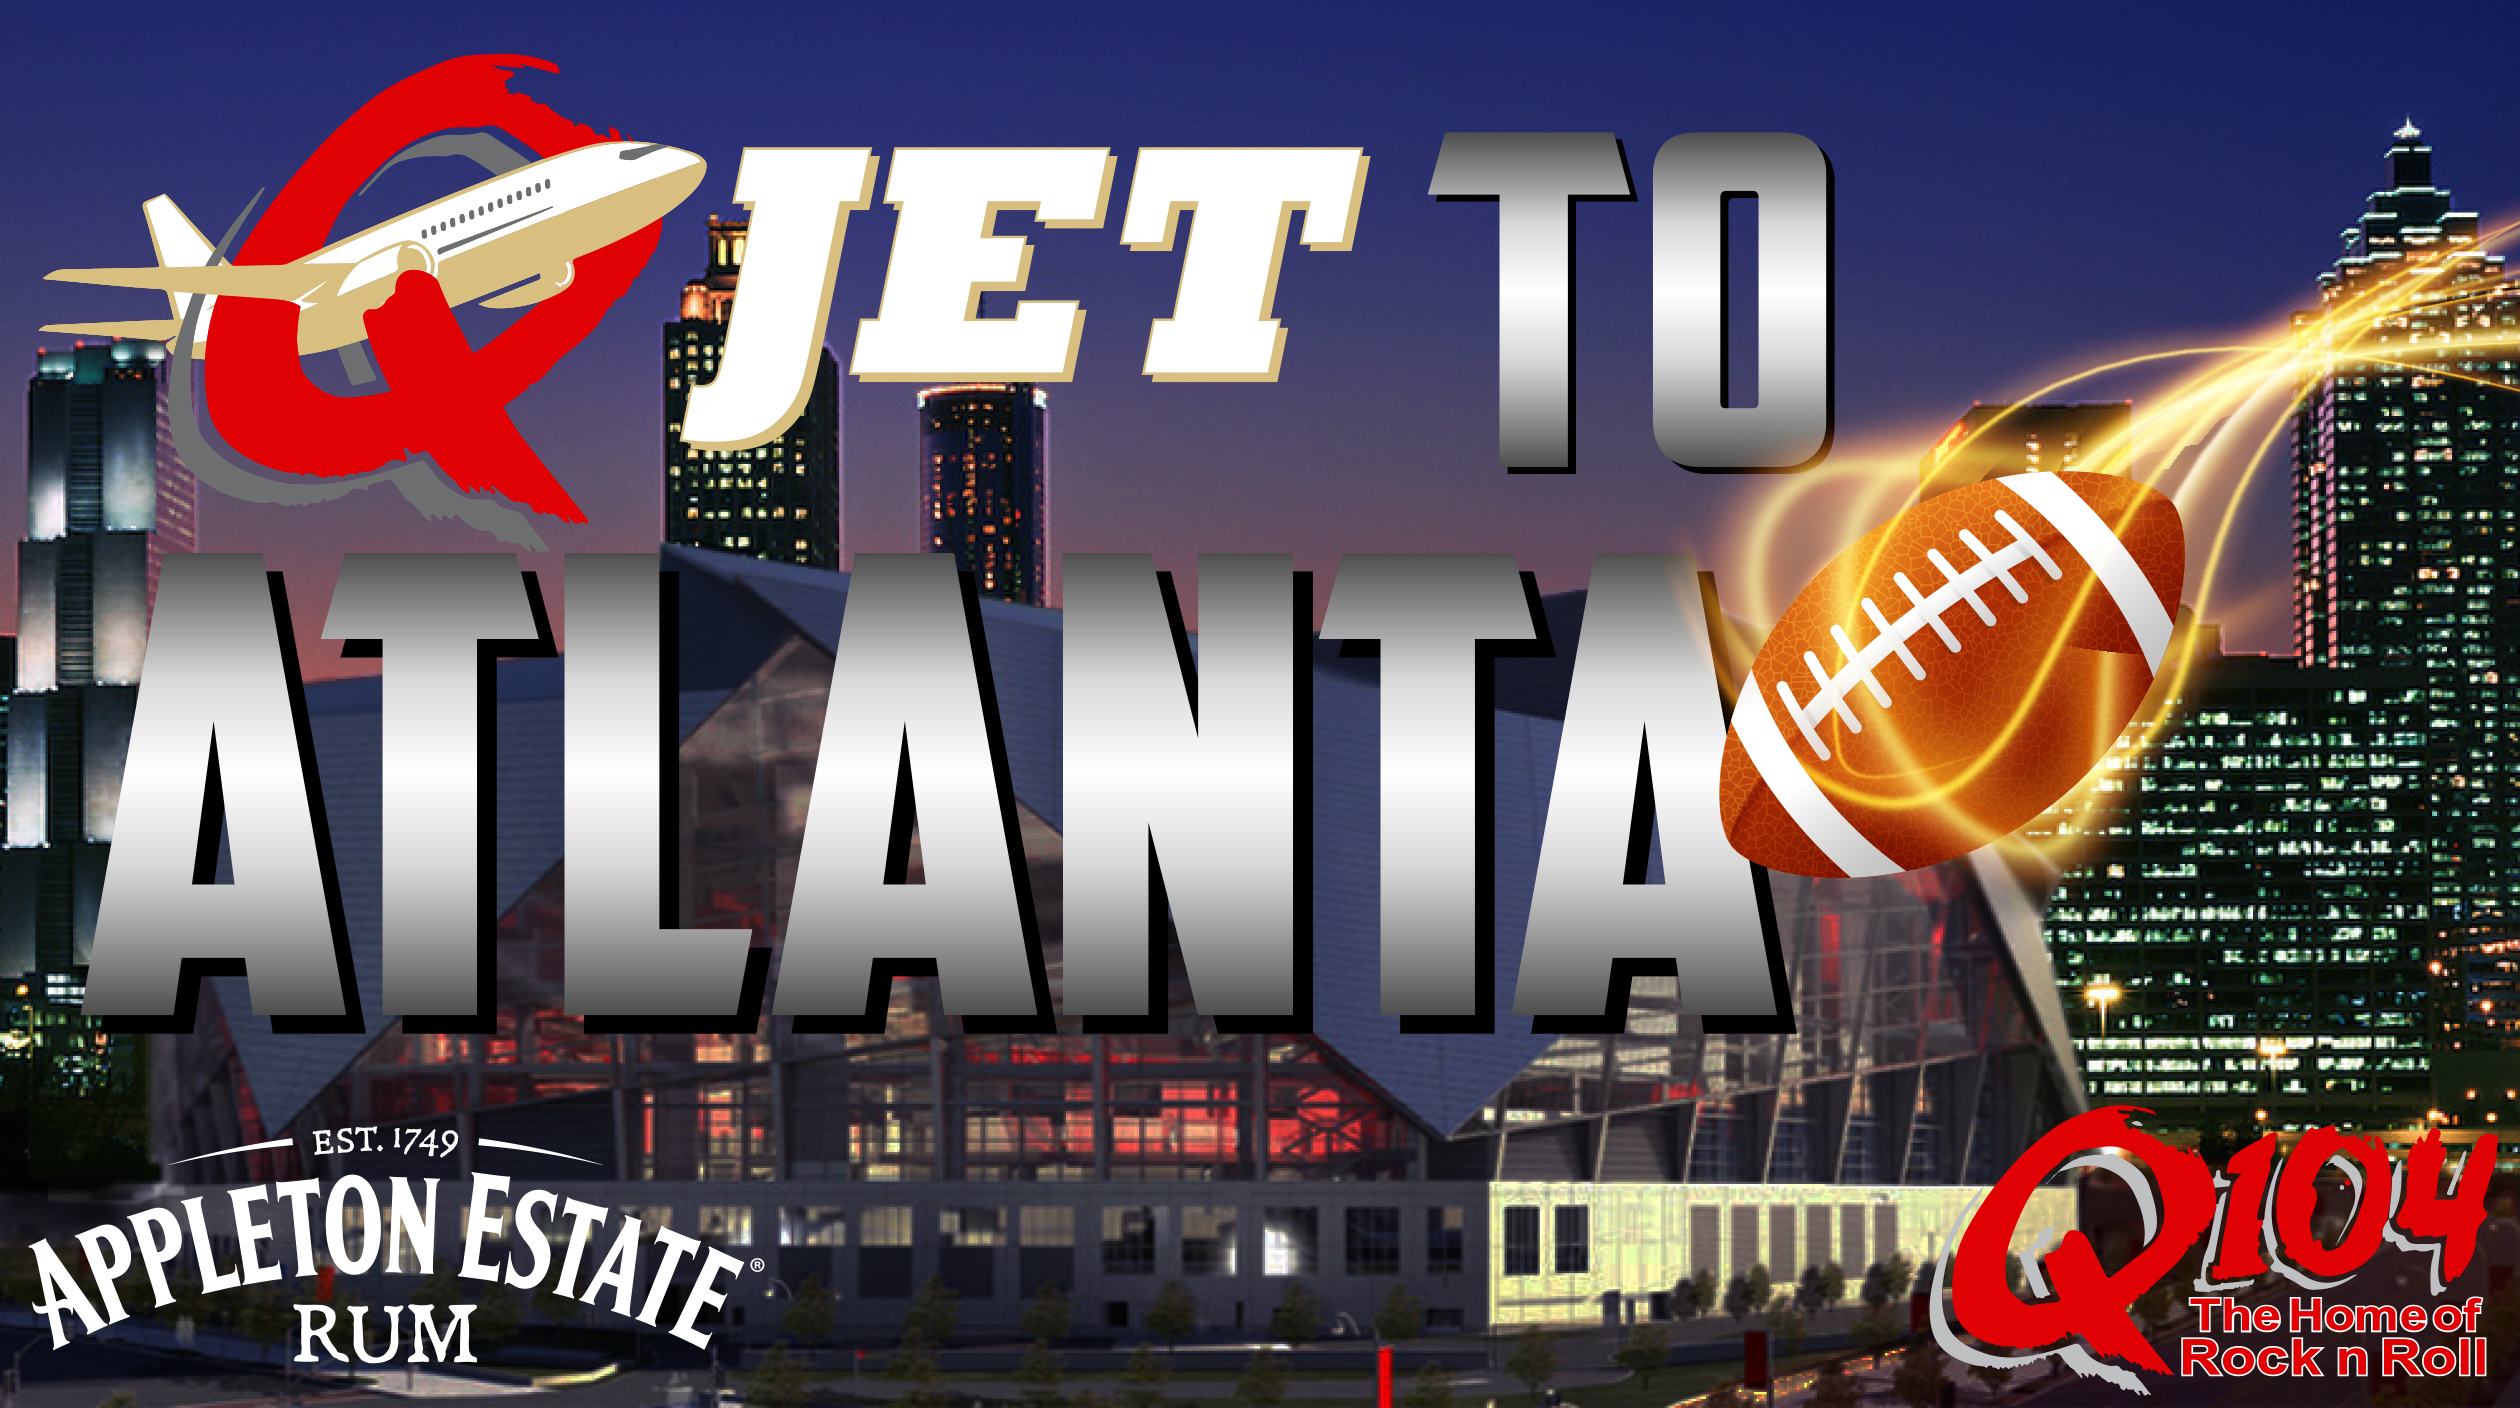 Q104's Q-JET to Atlanta